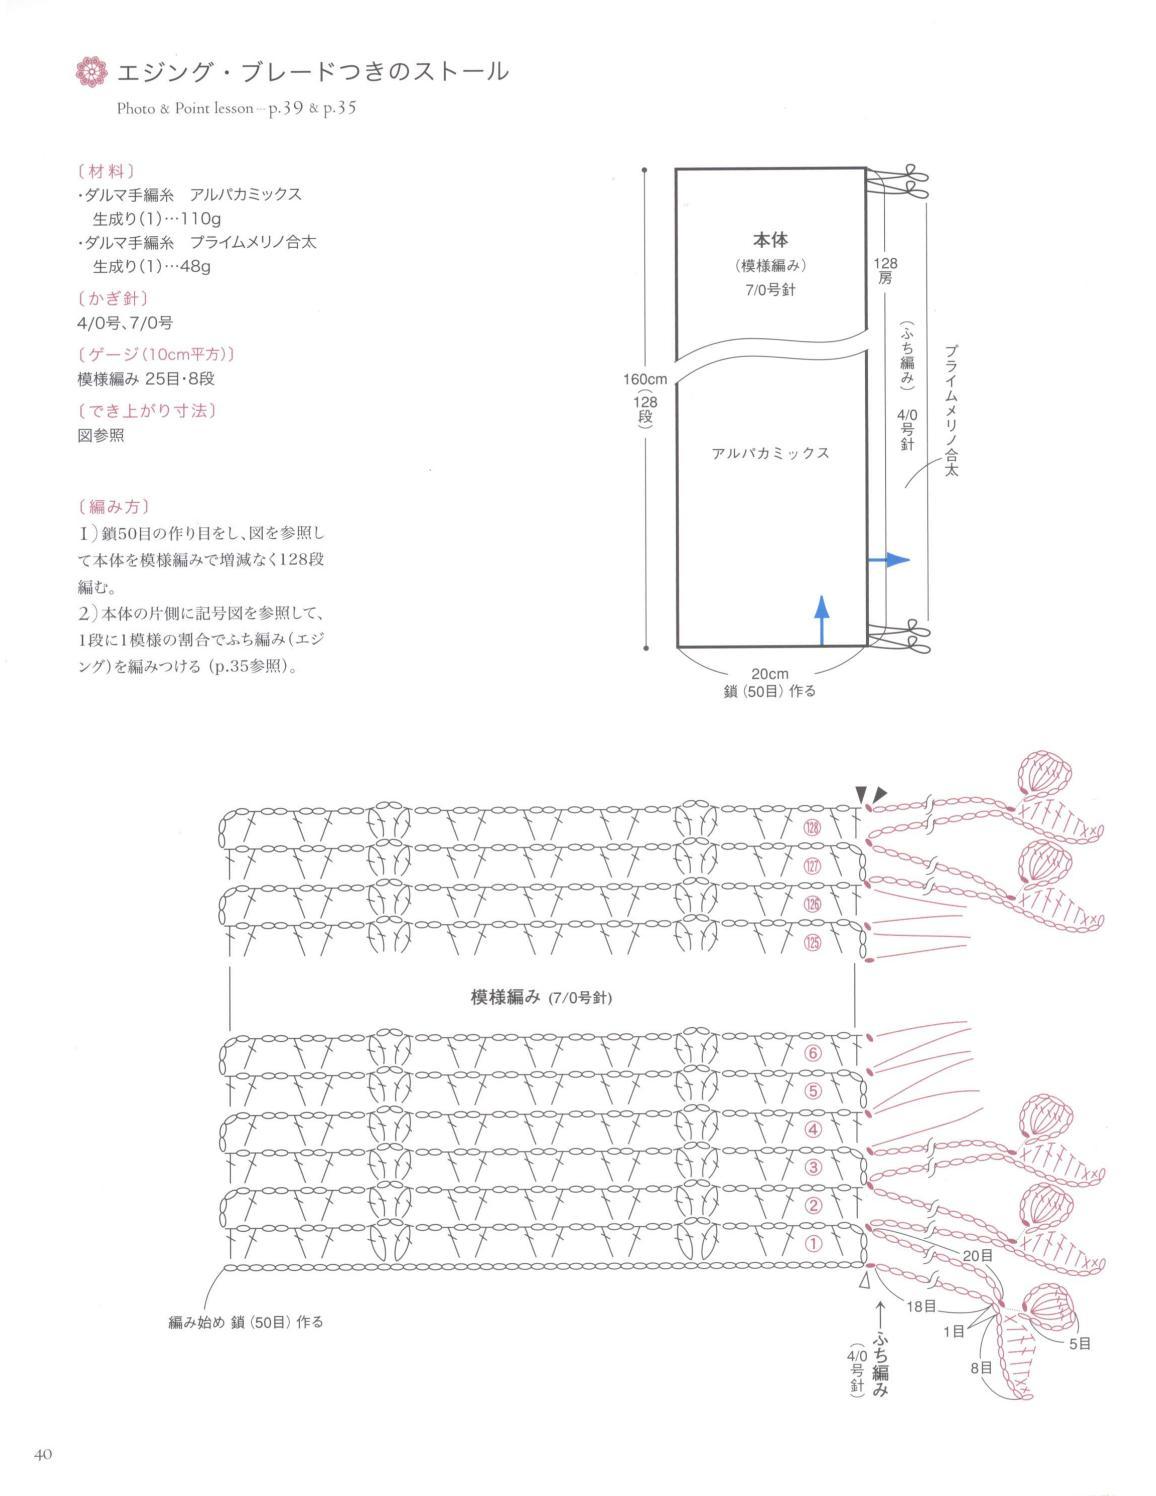 Asahi original crochet best selection 2012 page 40